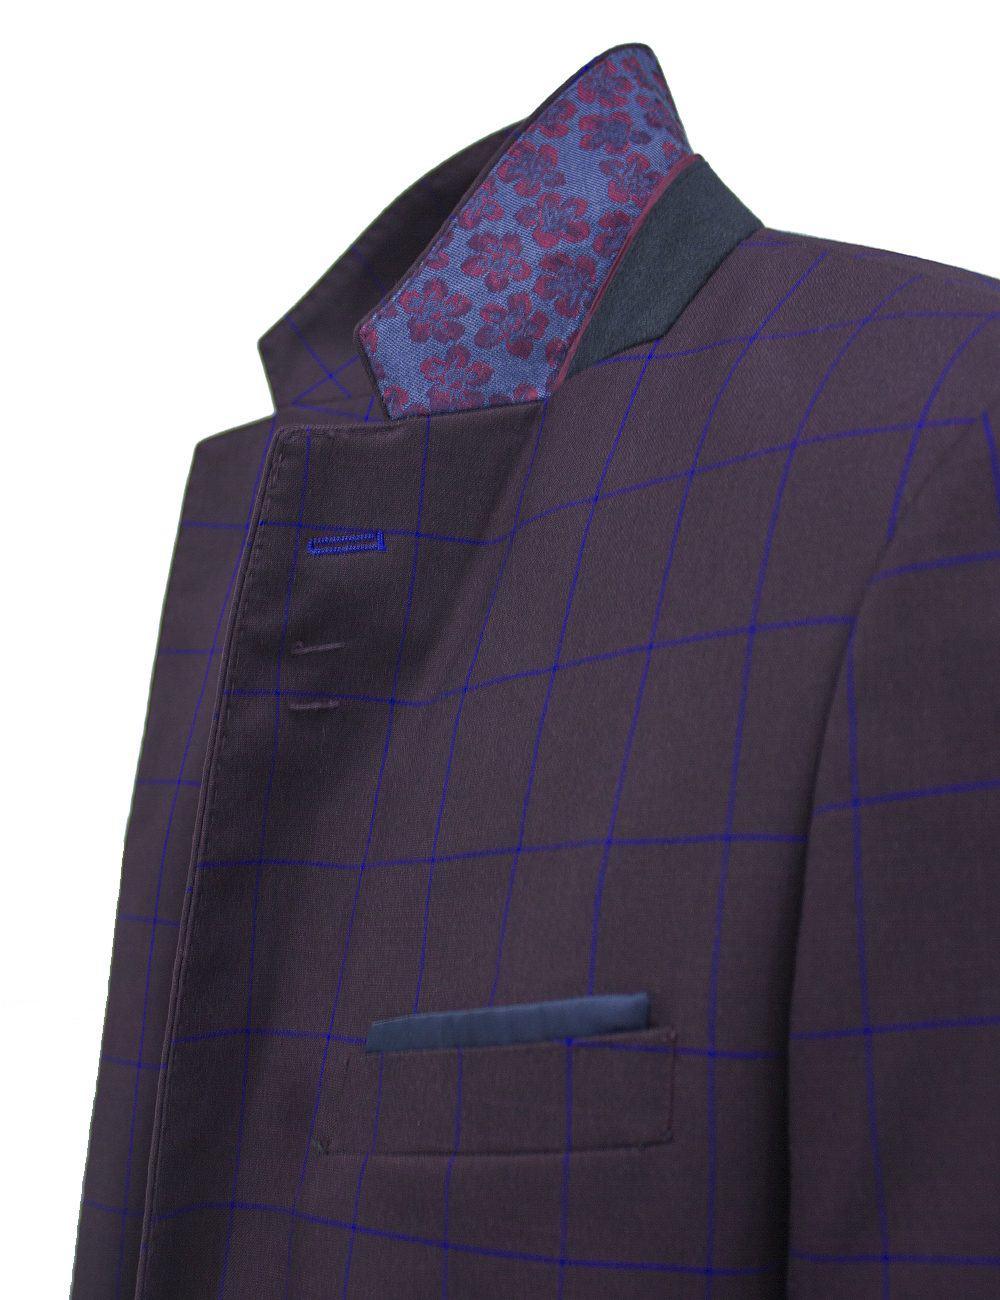 Slim Fit Maroon with Blue Checks Single Breasted Blazer - S2B3.4